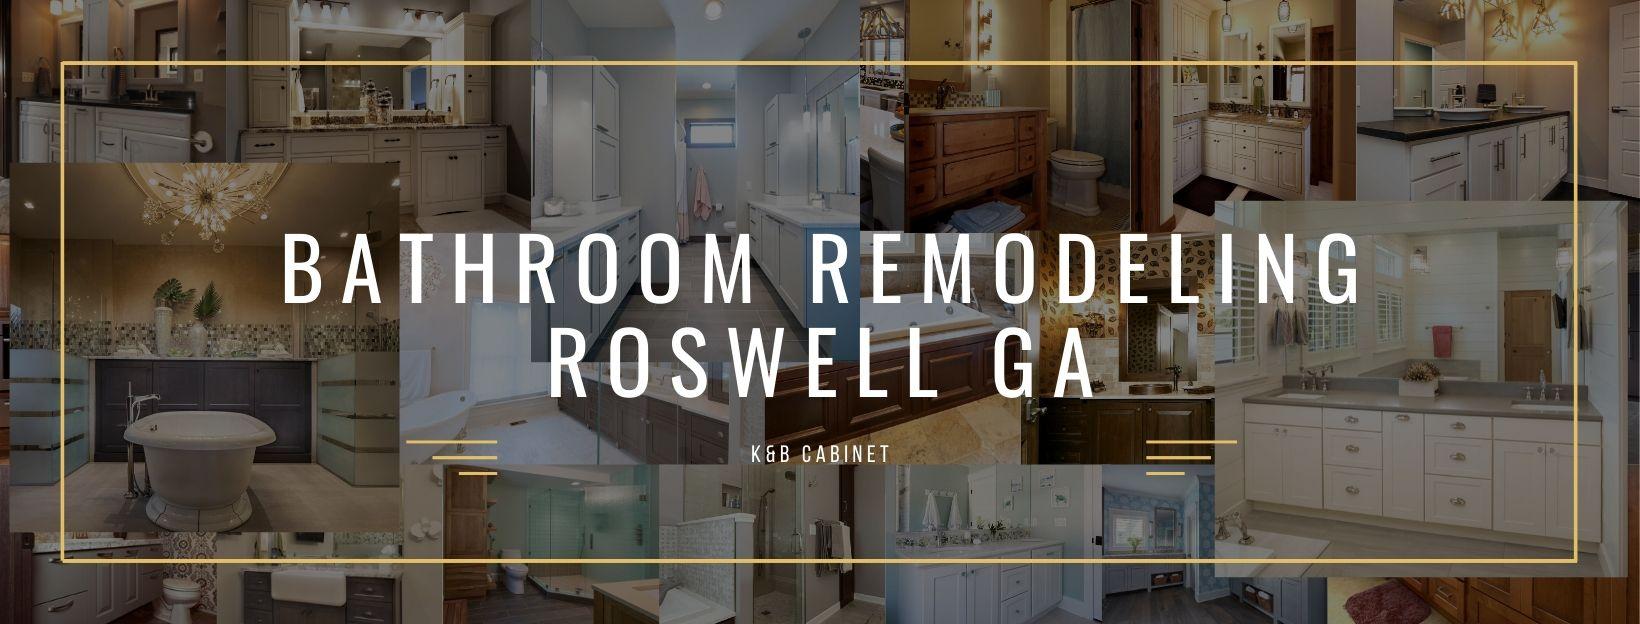 Bathroom Remodeling Roswell GA